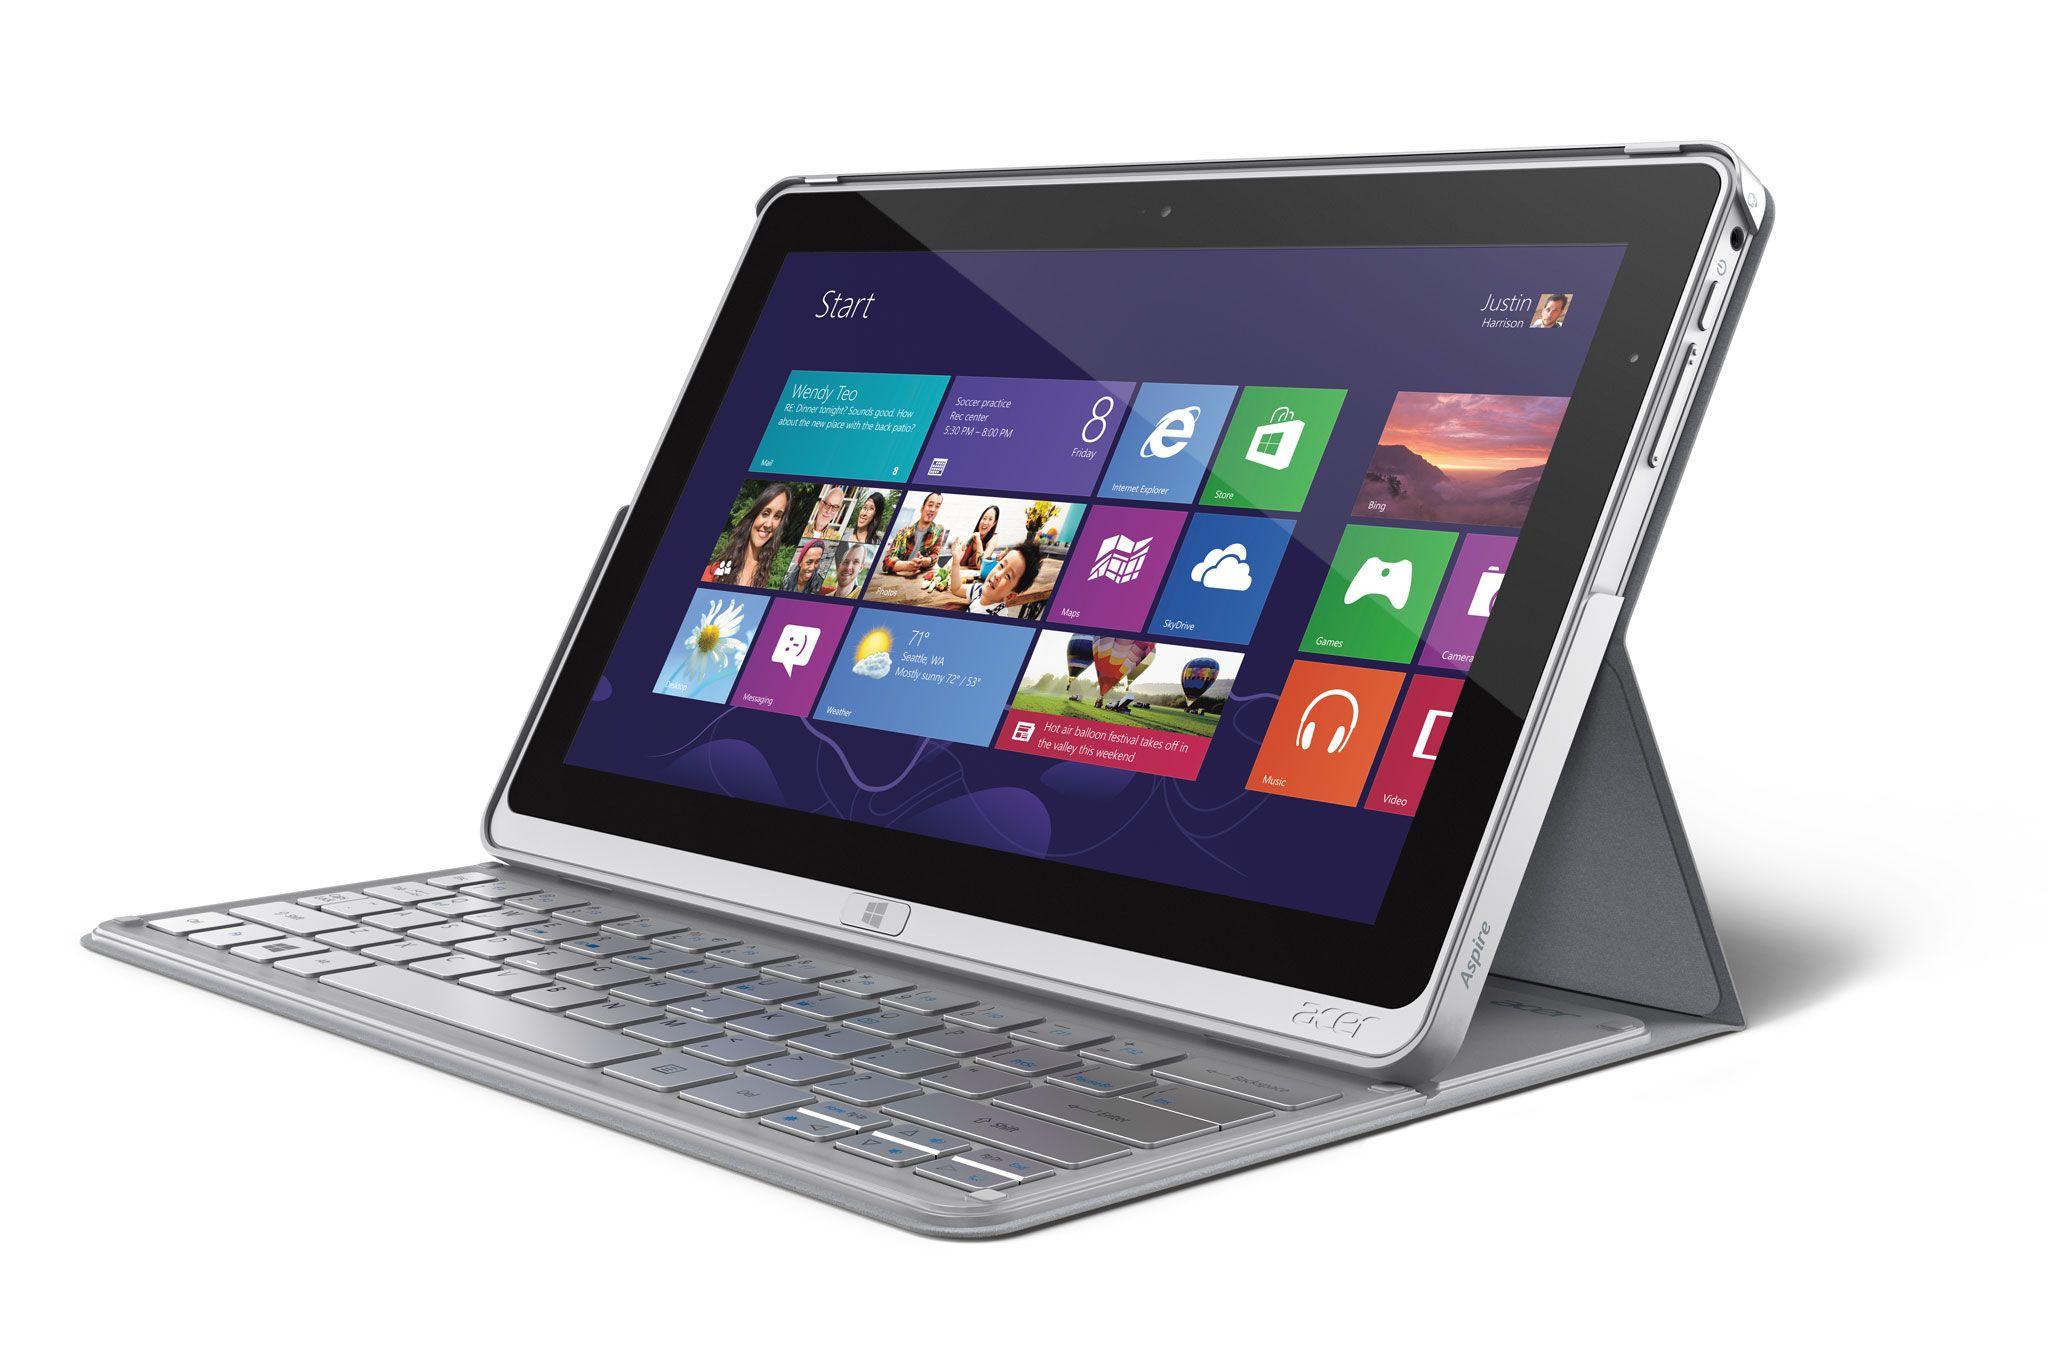 Daftar Harga Laptop Acer Postekno Pinterest Acer